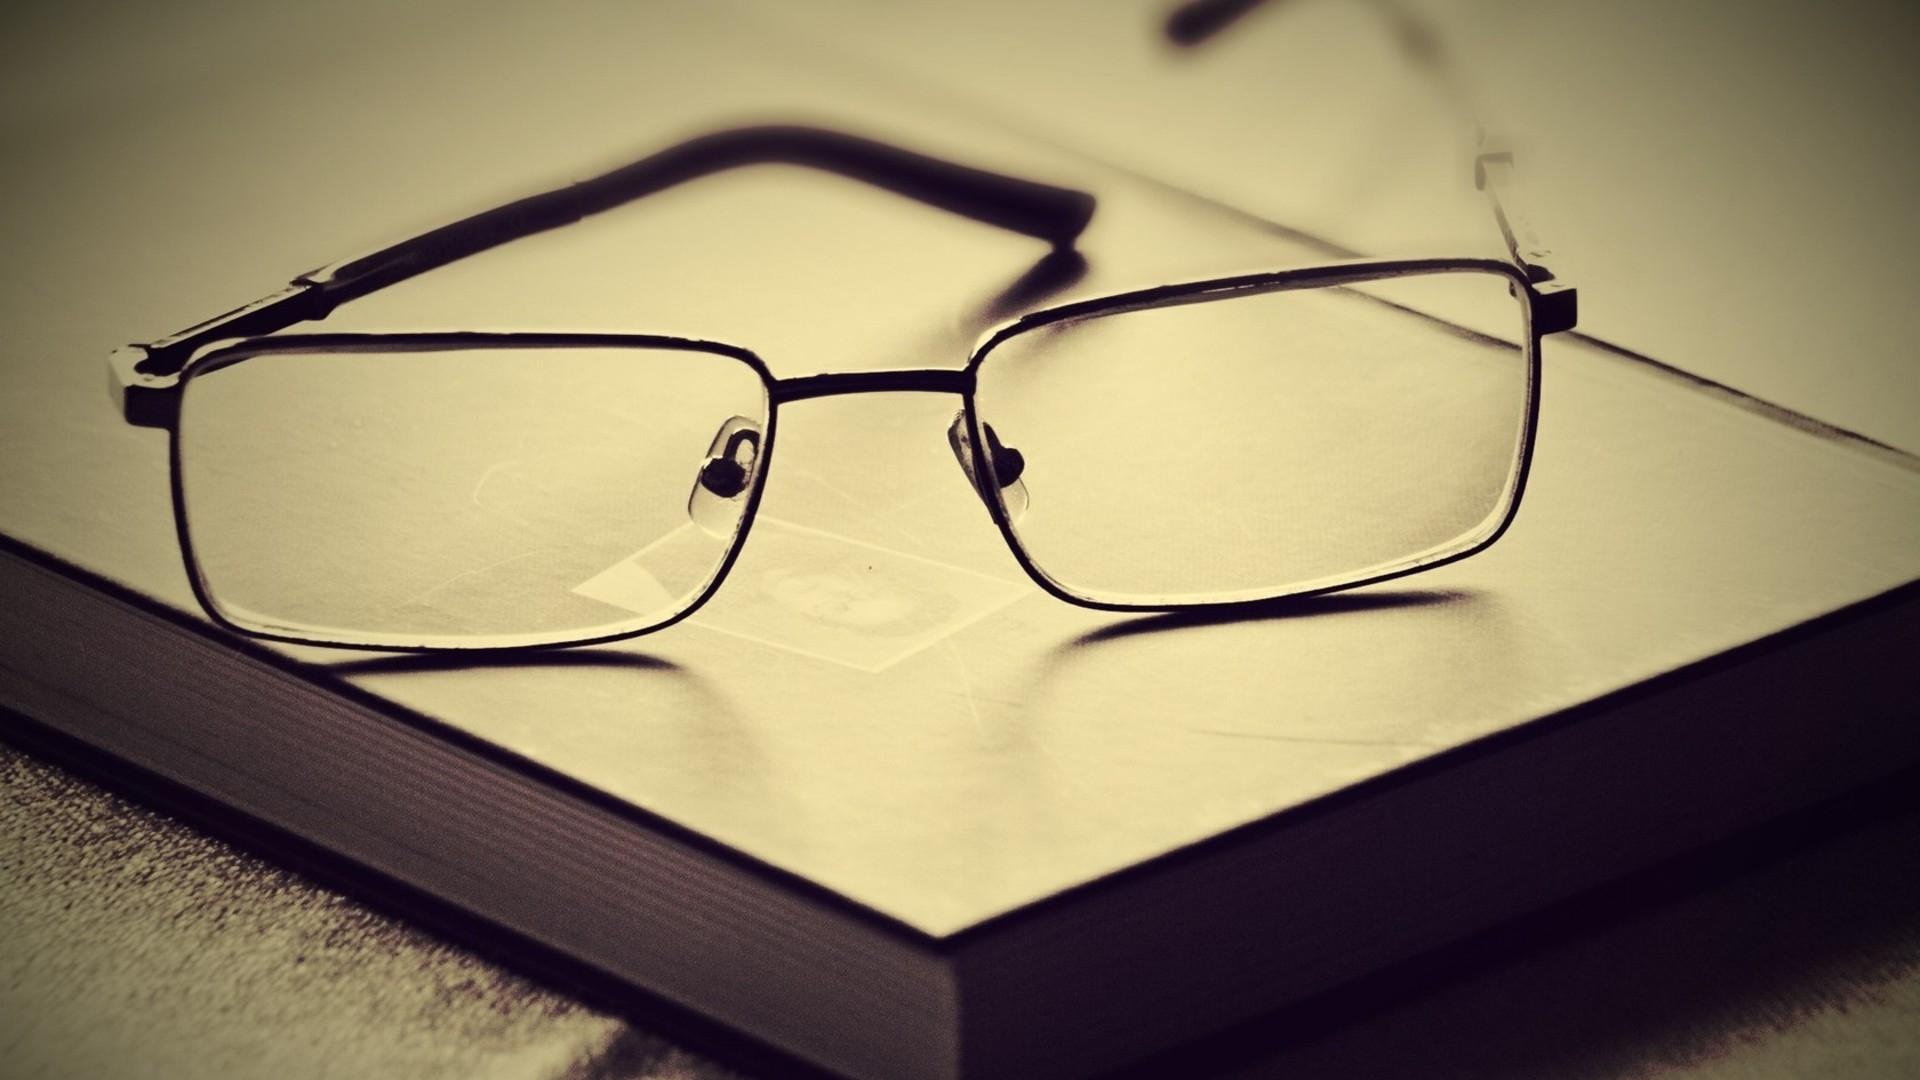 wallpaper : black, sunglasses, glasses, circle, book, shape, lenses